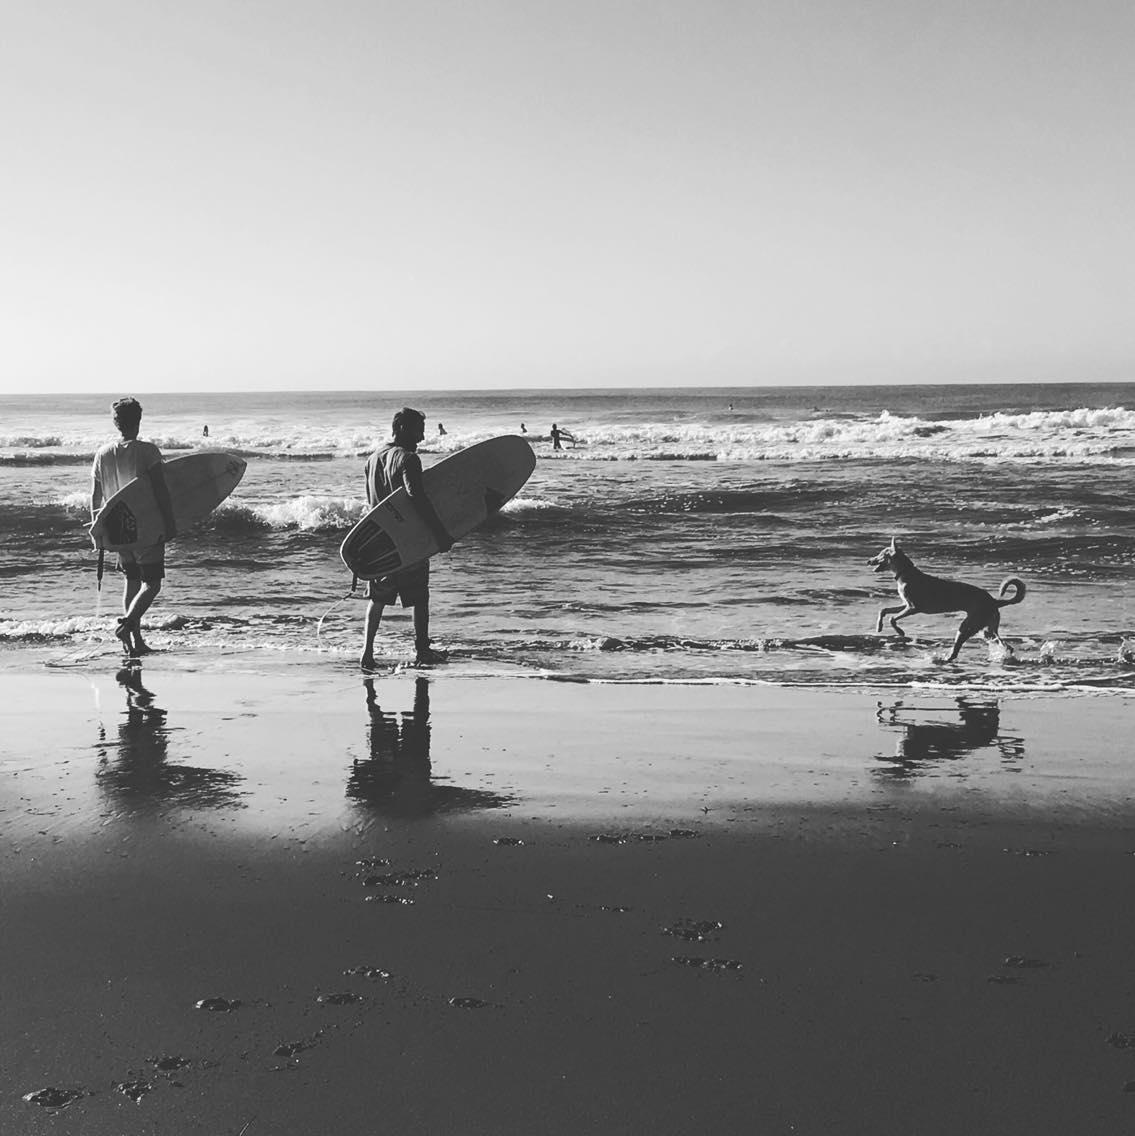 Beach Surf Waves